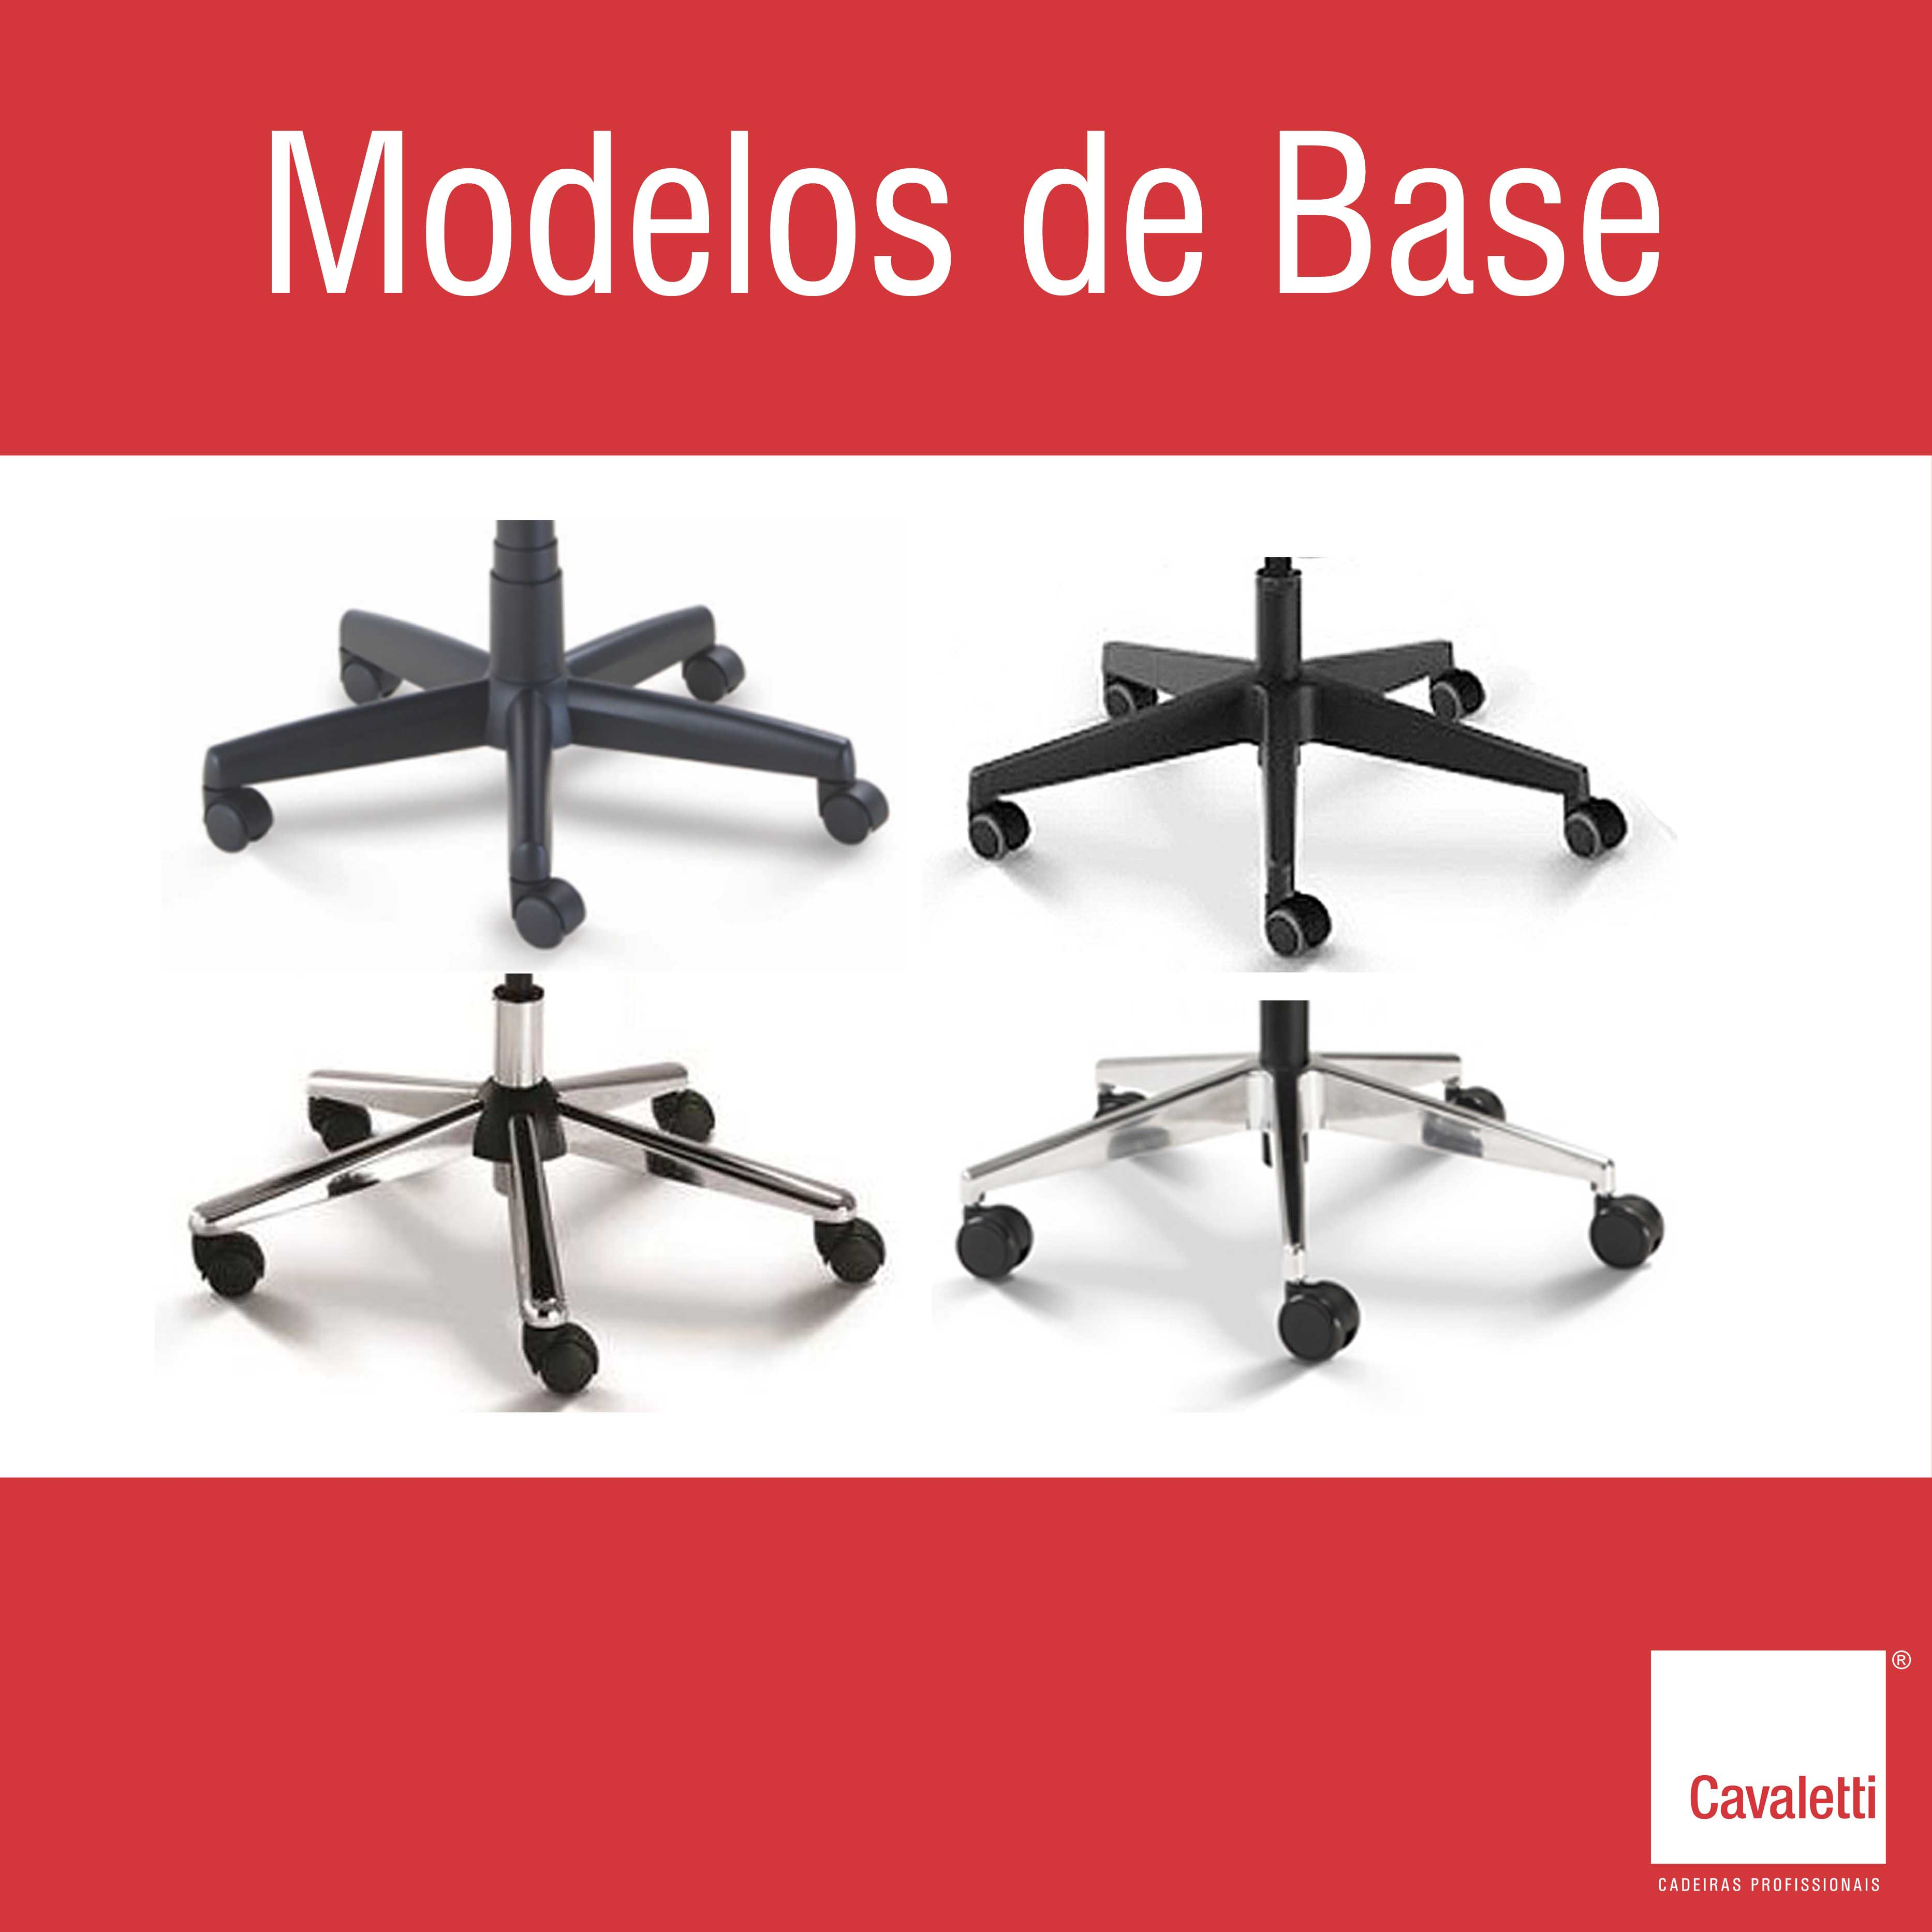 Modelos de Base